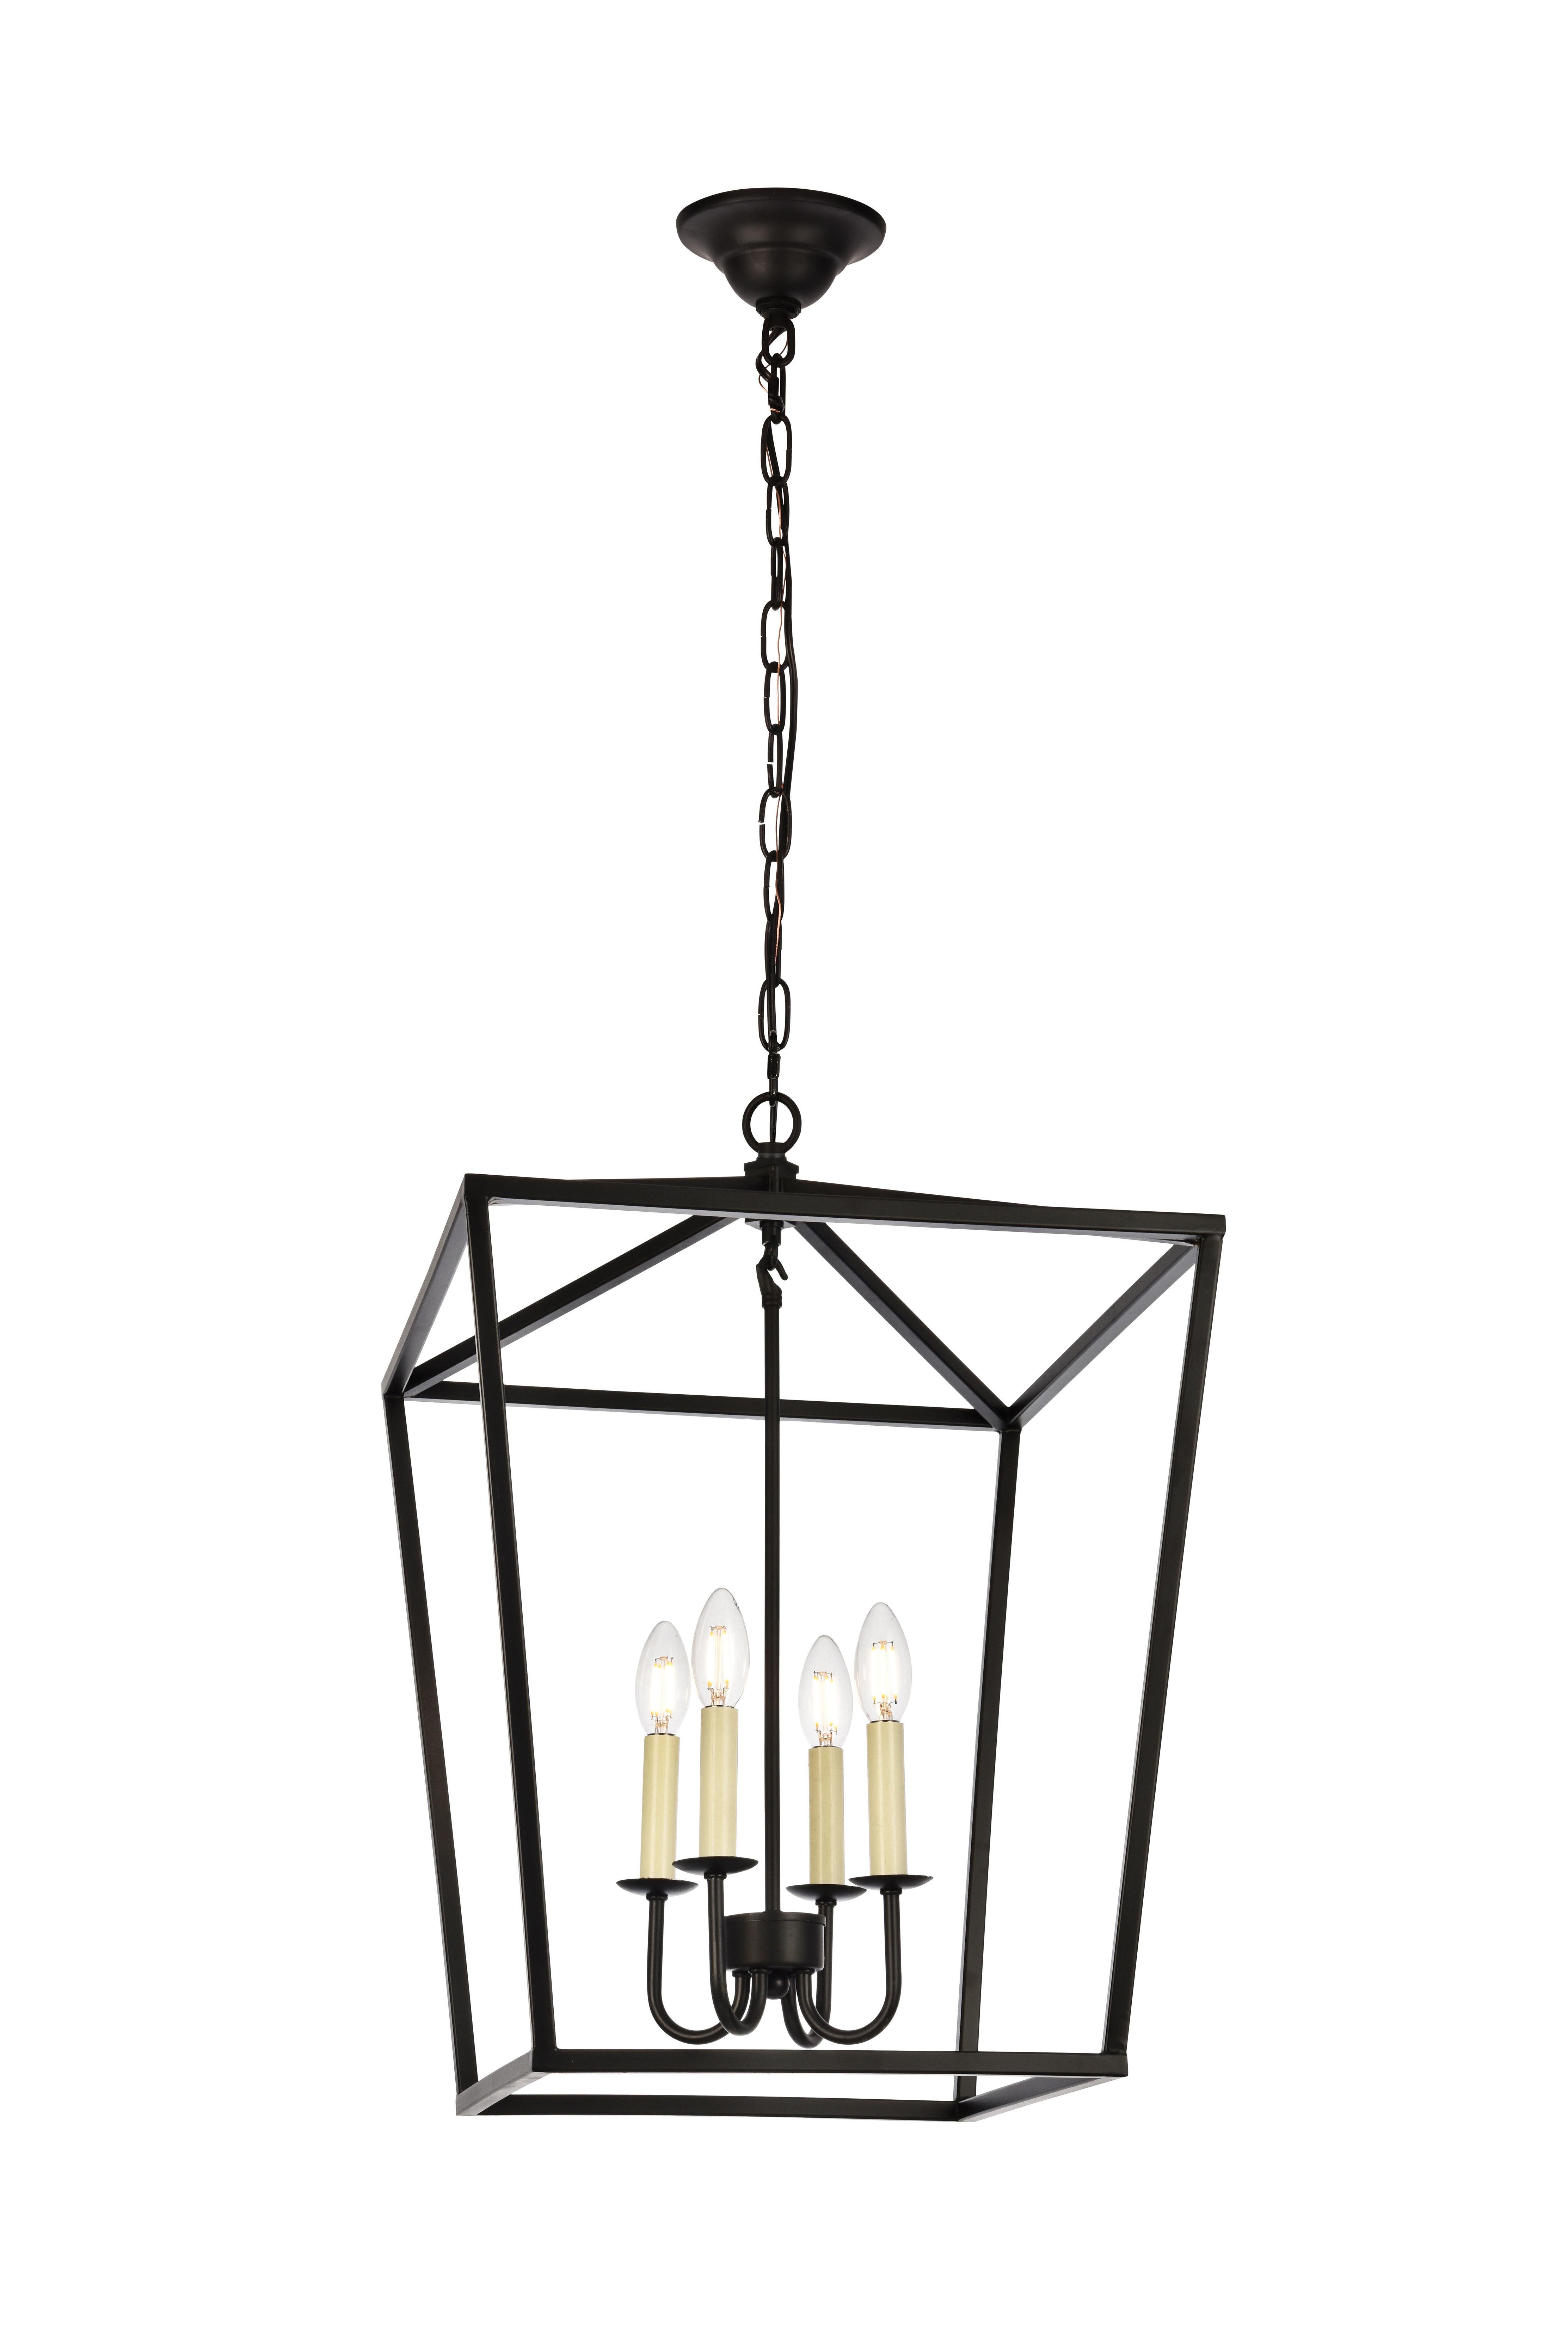 2019 Daphne 4 Light Foyer Pendant Regarding Varnum 4 Light Lantern Pendants (View 2 of 25)